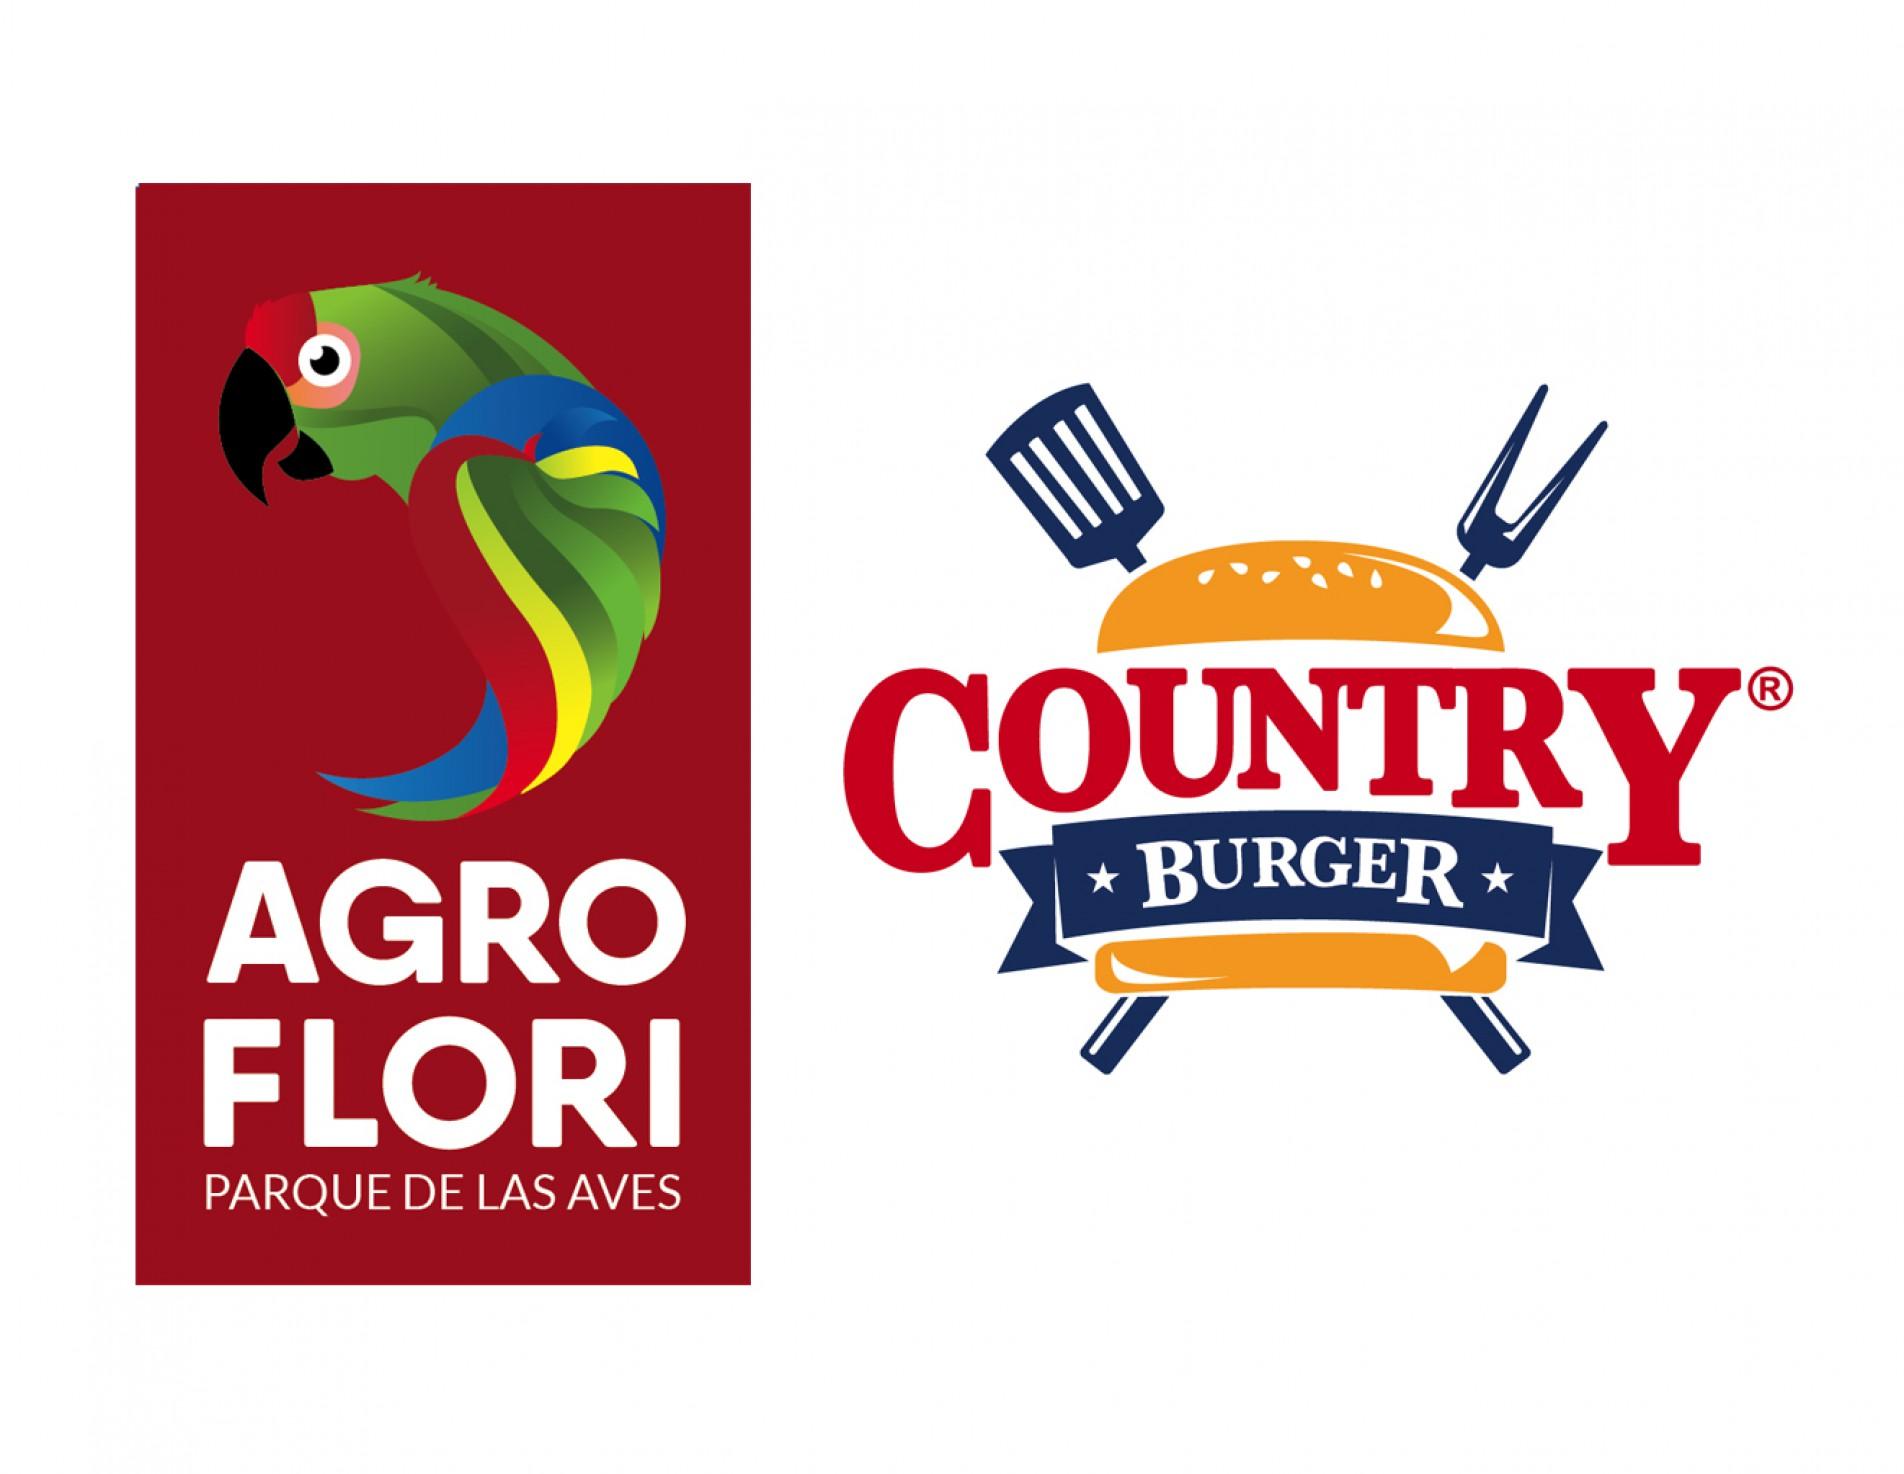 Branding / Identidad Corporativa